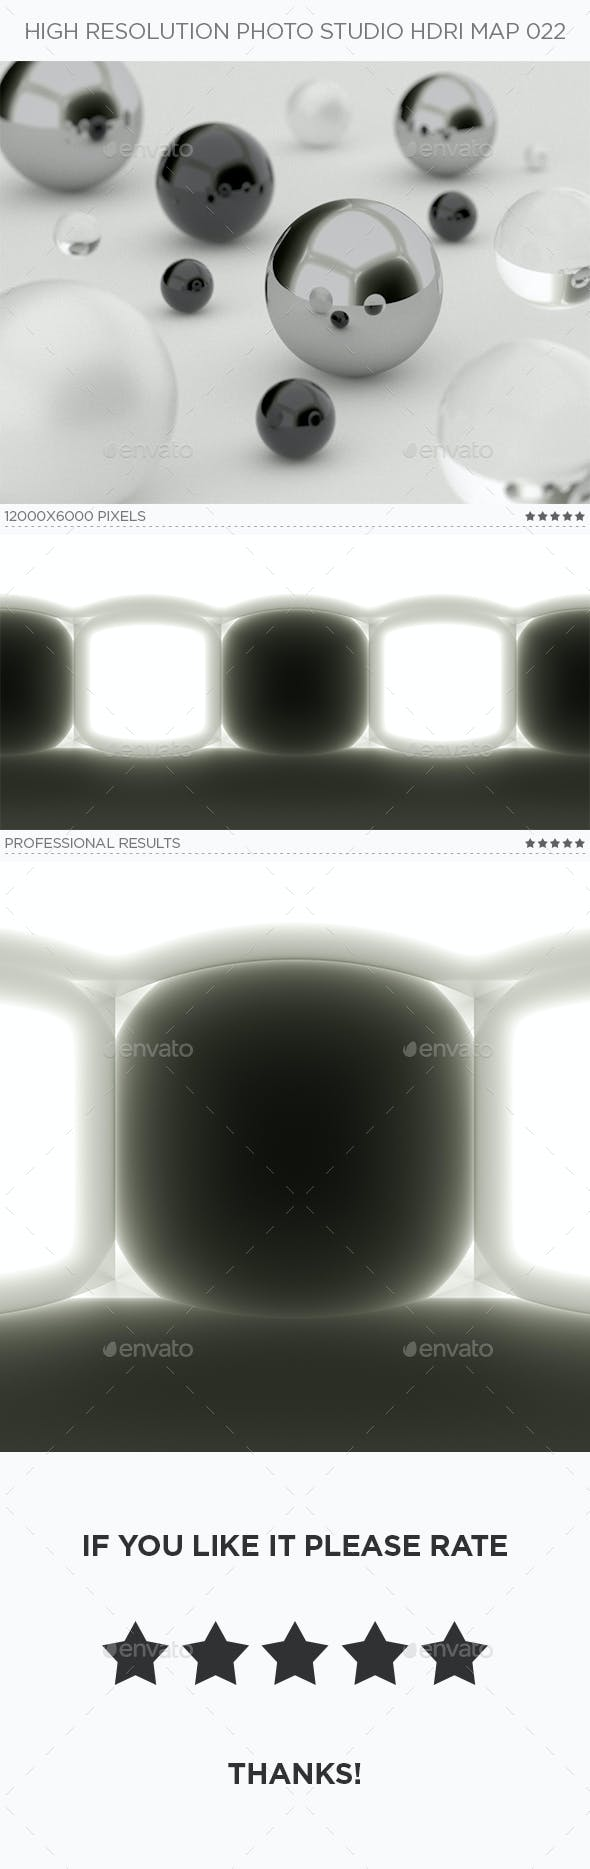 High Resolution Photo Studio HDRi Map 022 - 3DOcean Item for Sale